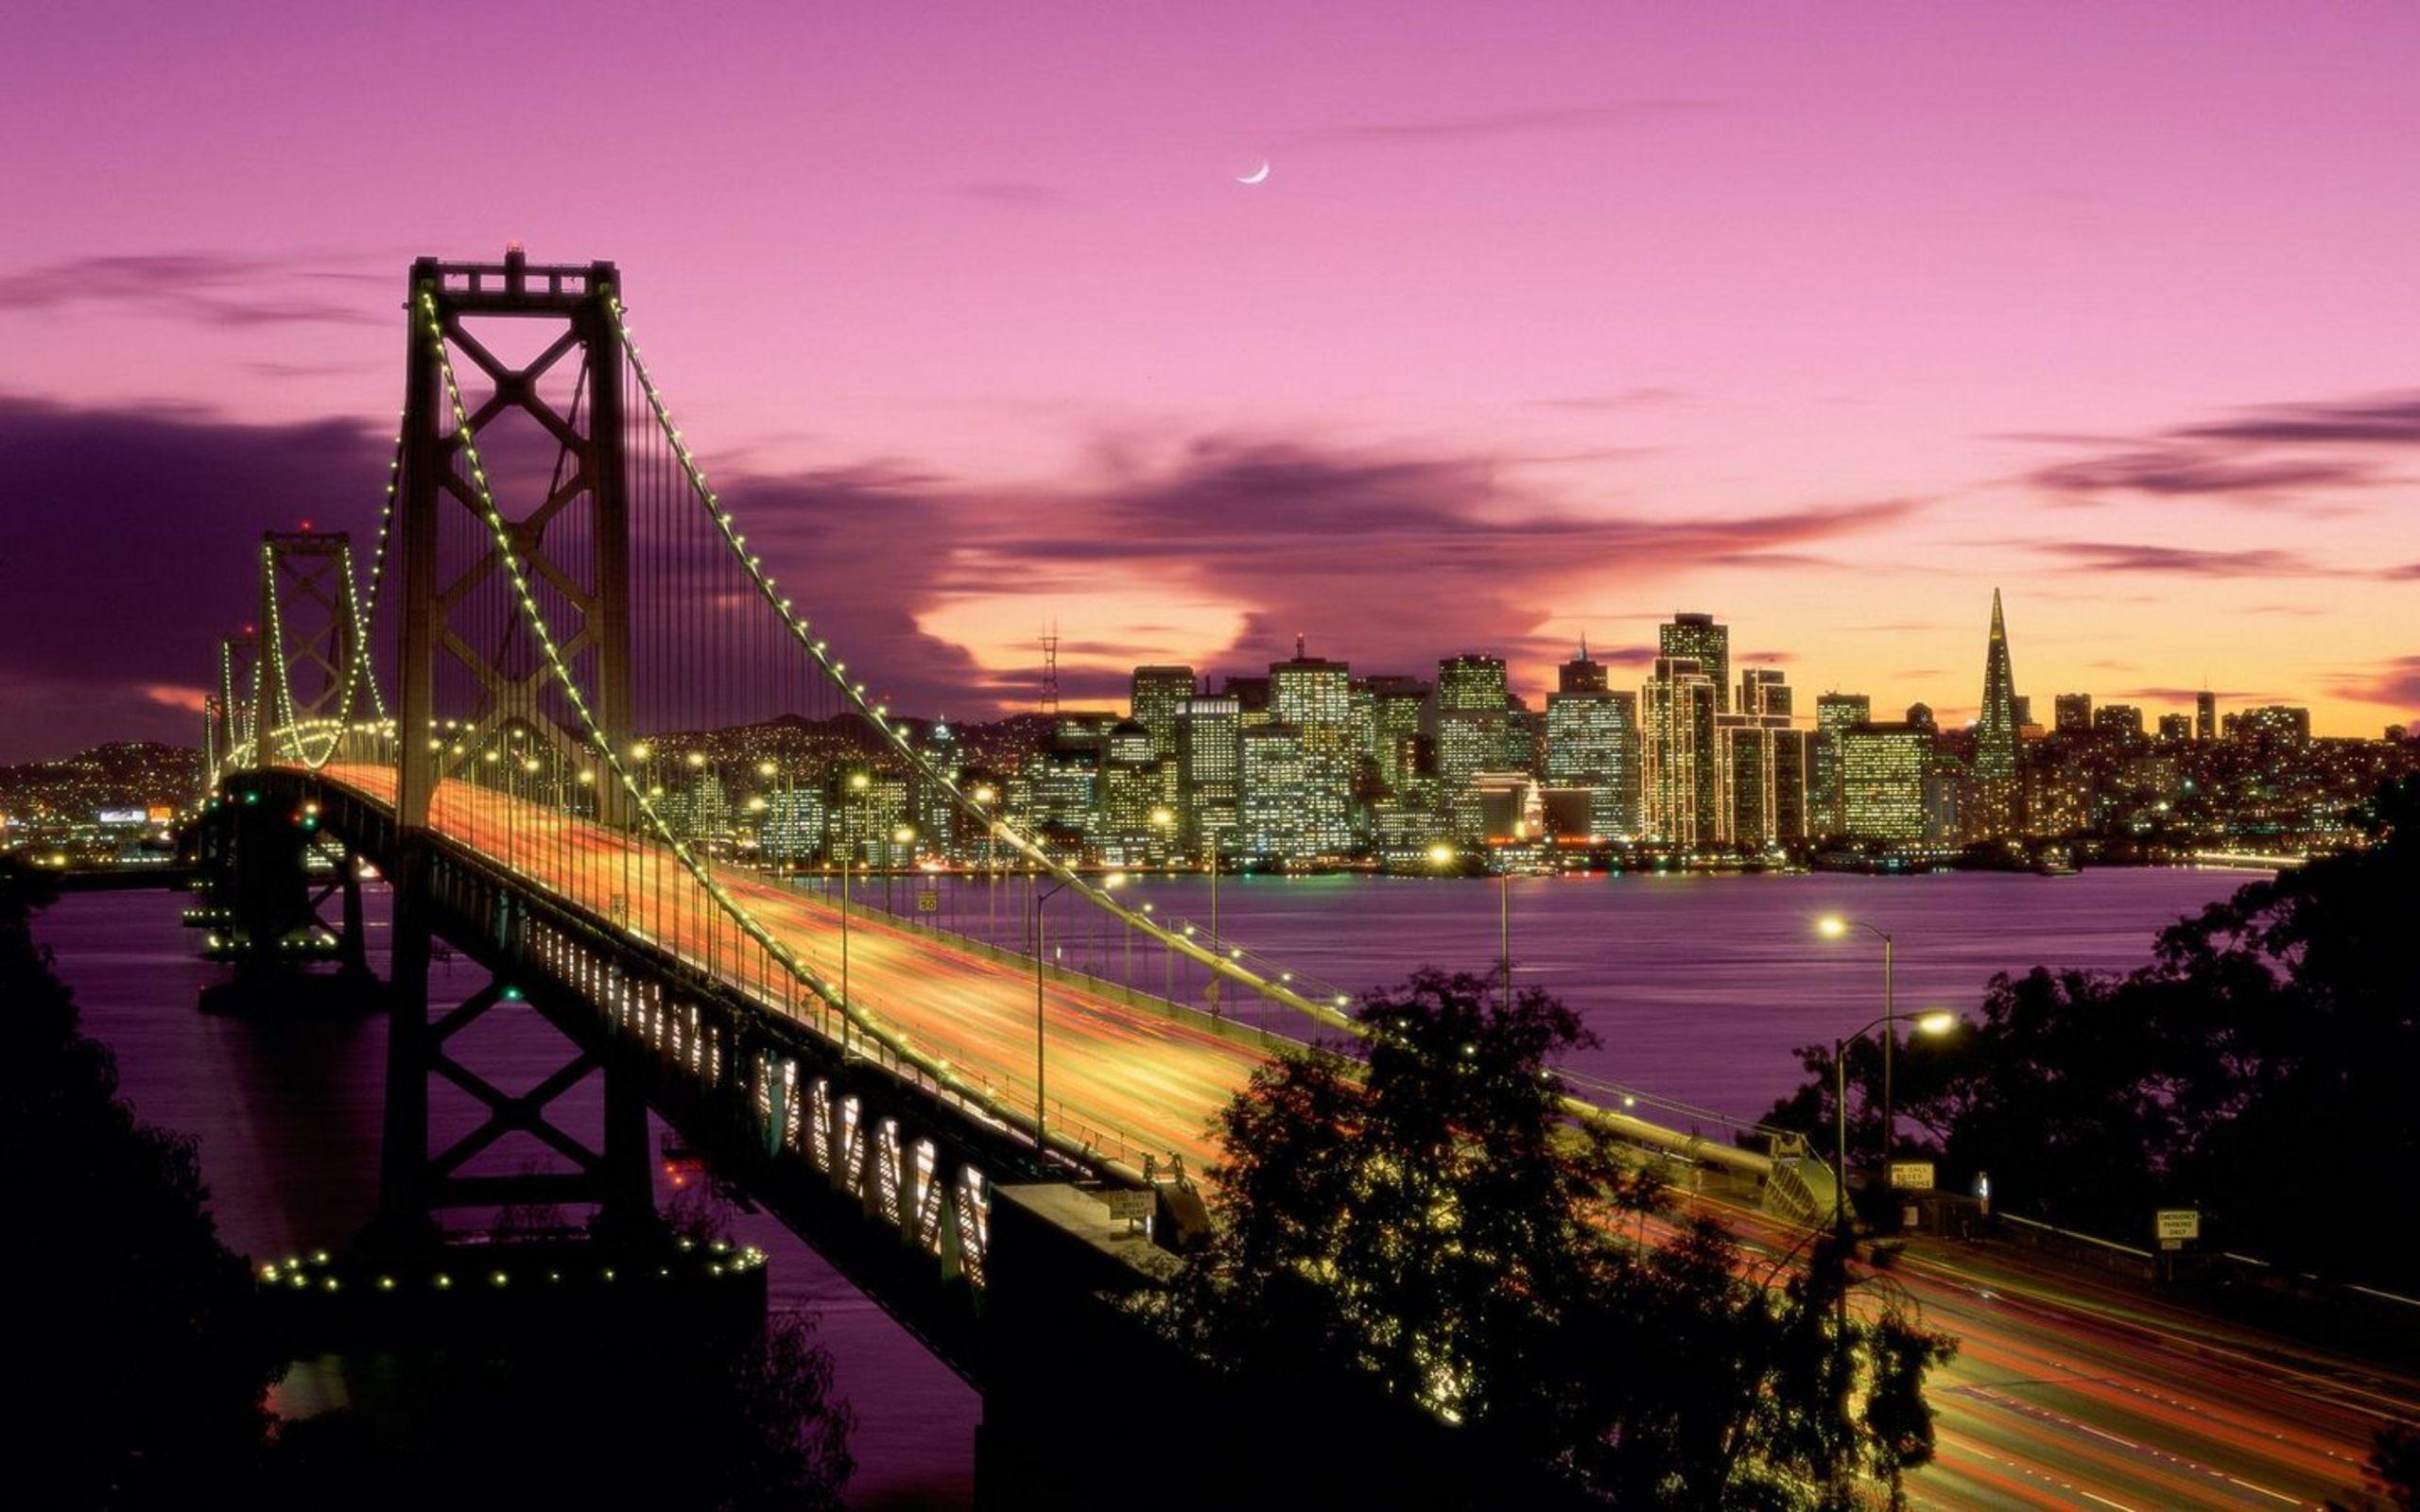 San Francisco beautiful wallpapers hd   Socialphy 2560x1600